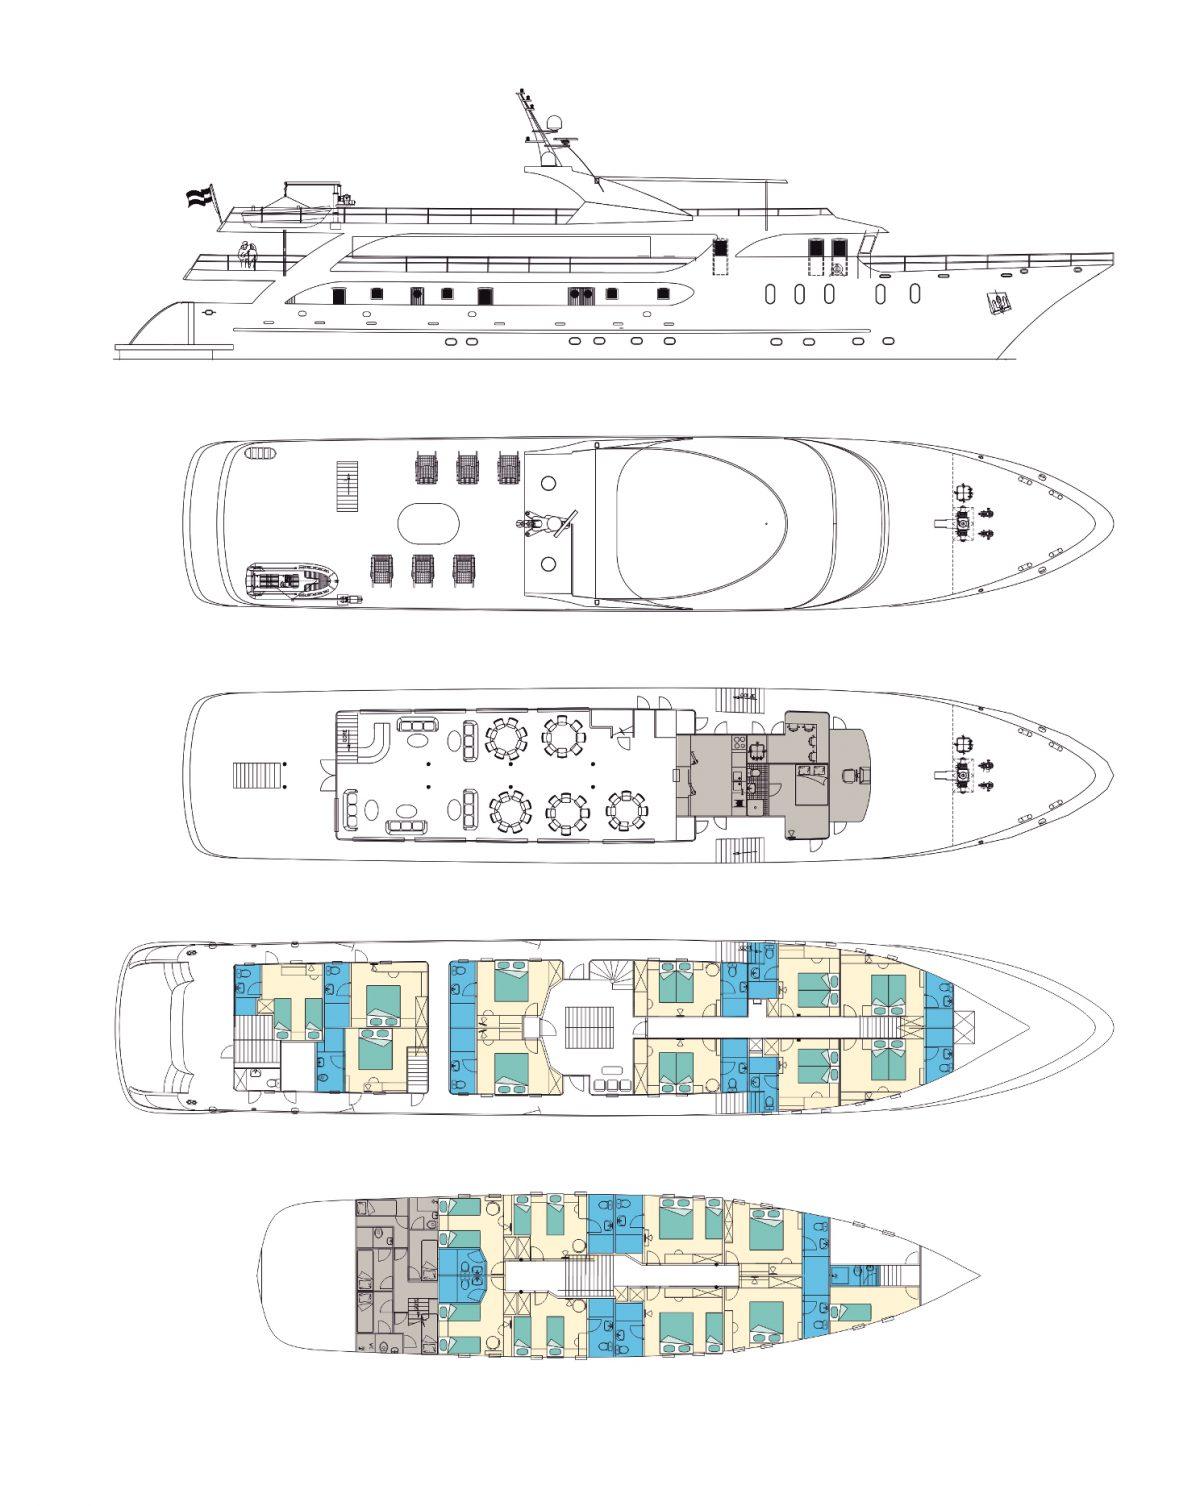 MV Maritimo Deck Plan